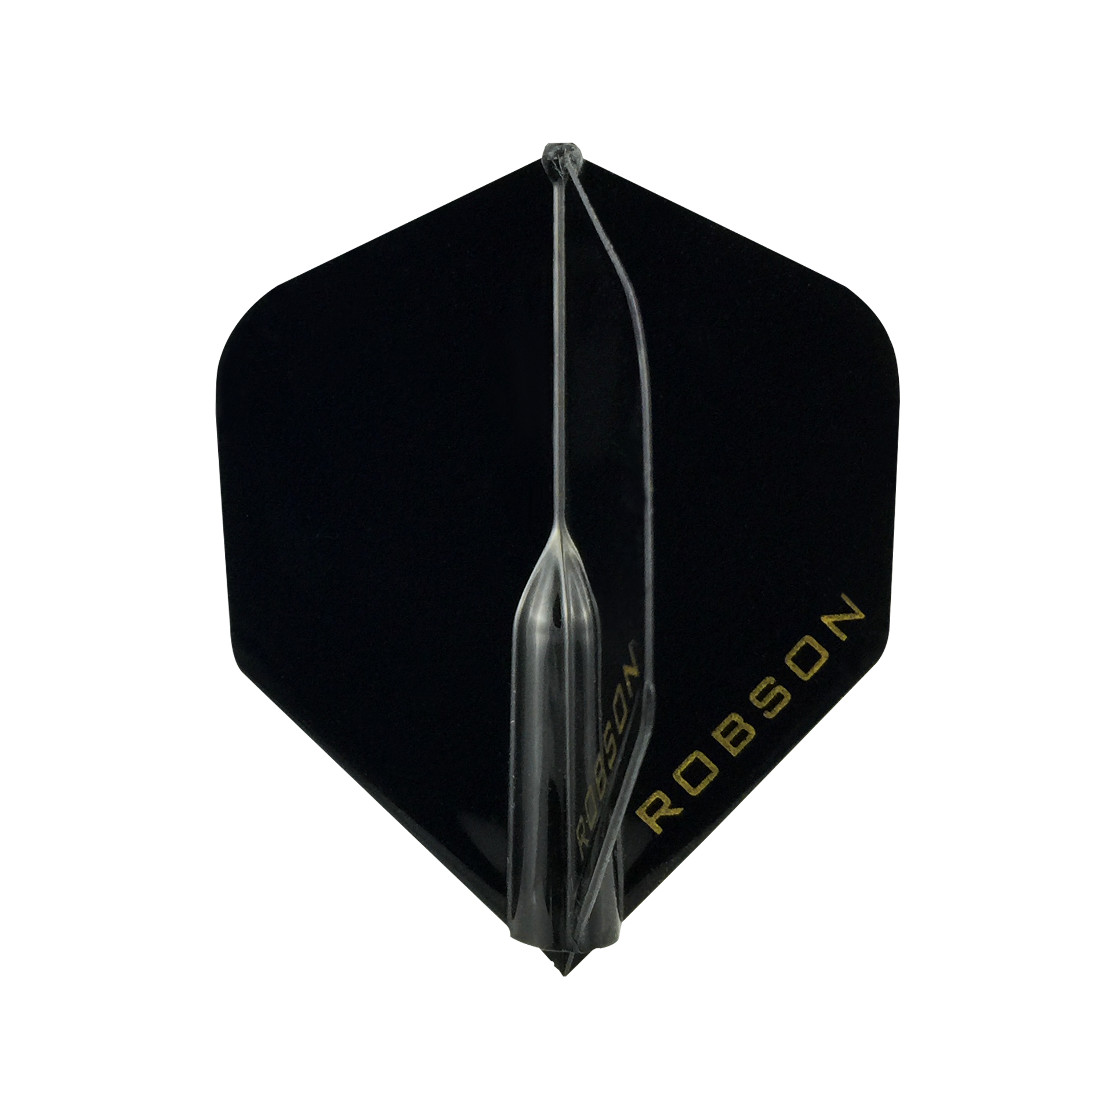 Queuekoffer Standard schwarz